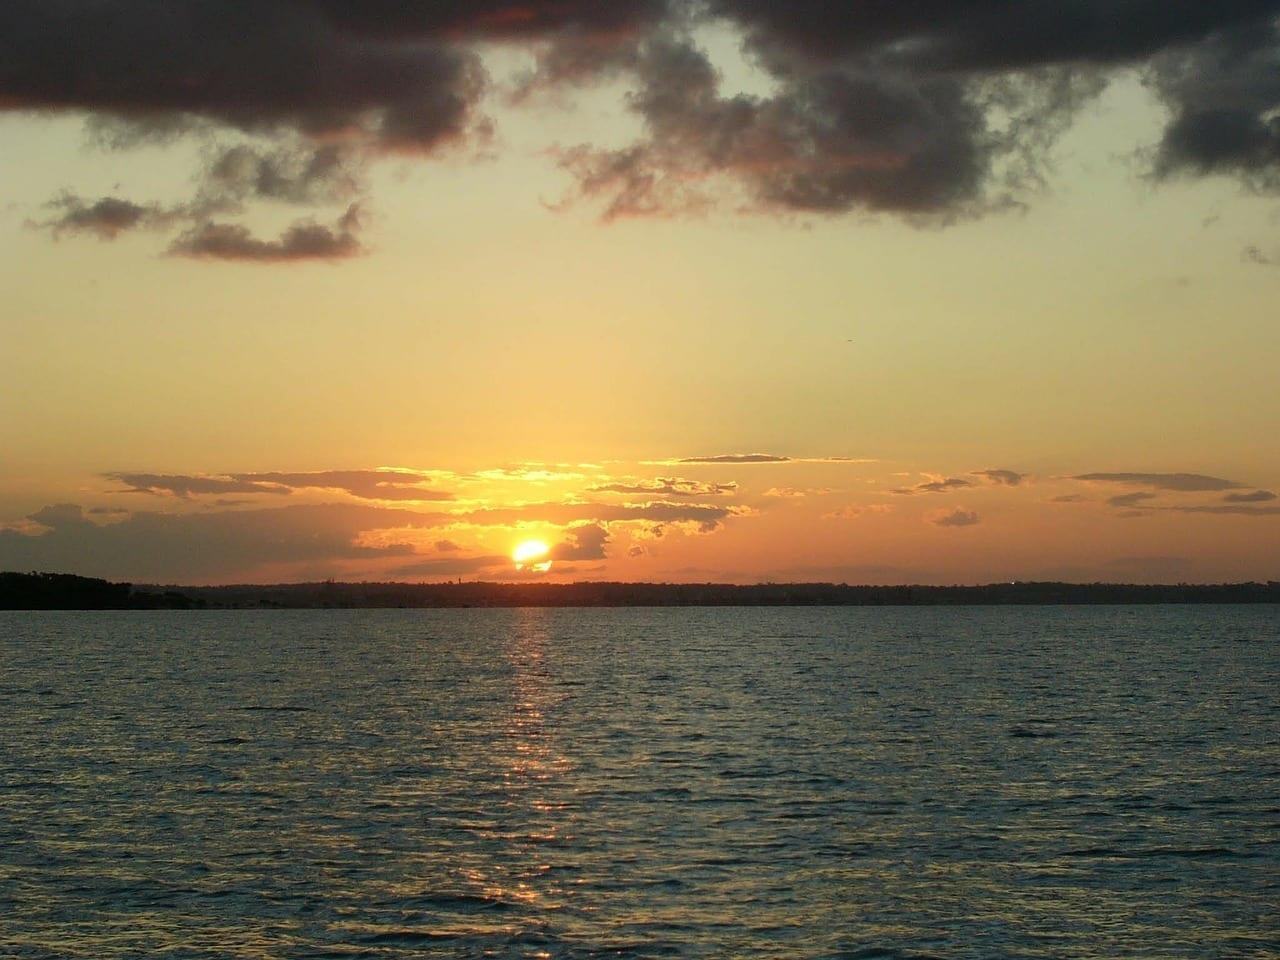 Puesta De Sol Océano Sunset Gold Coast Australia